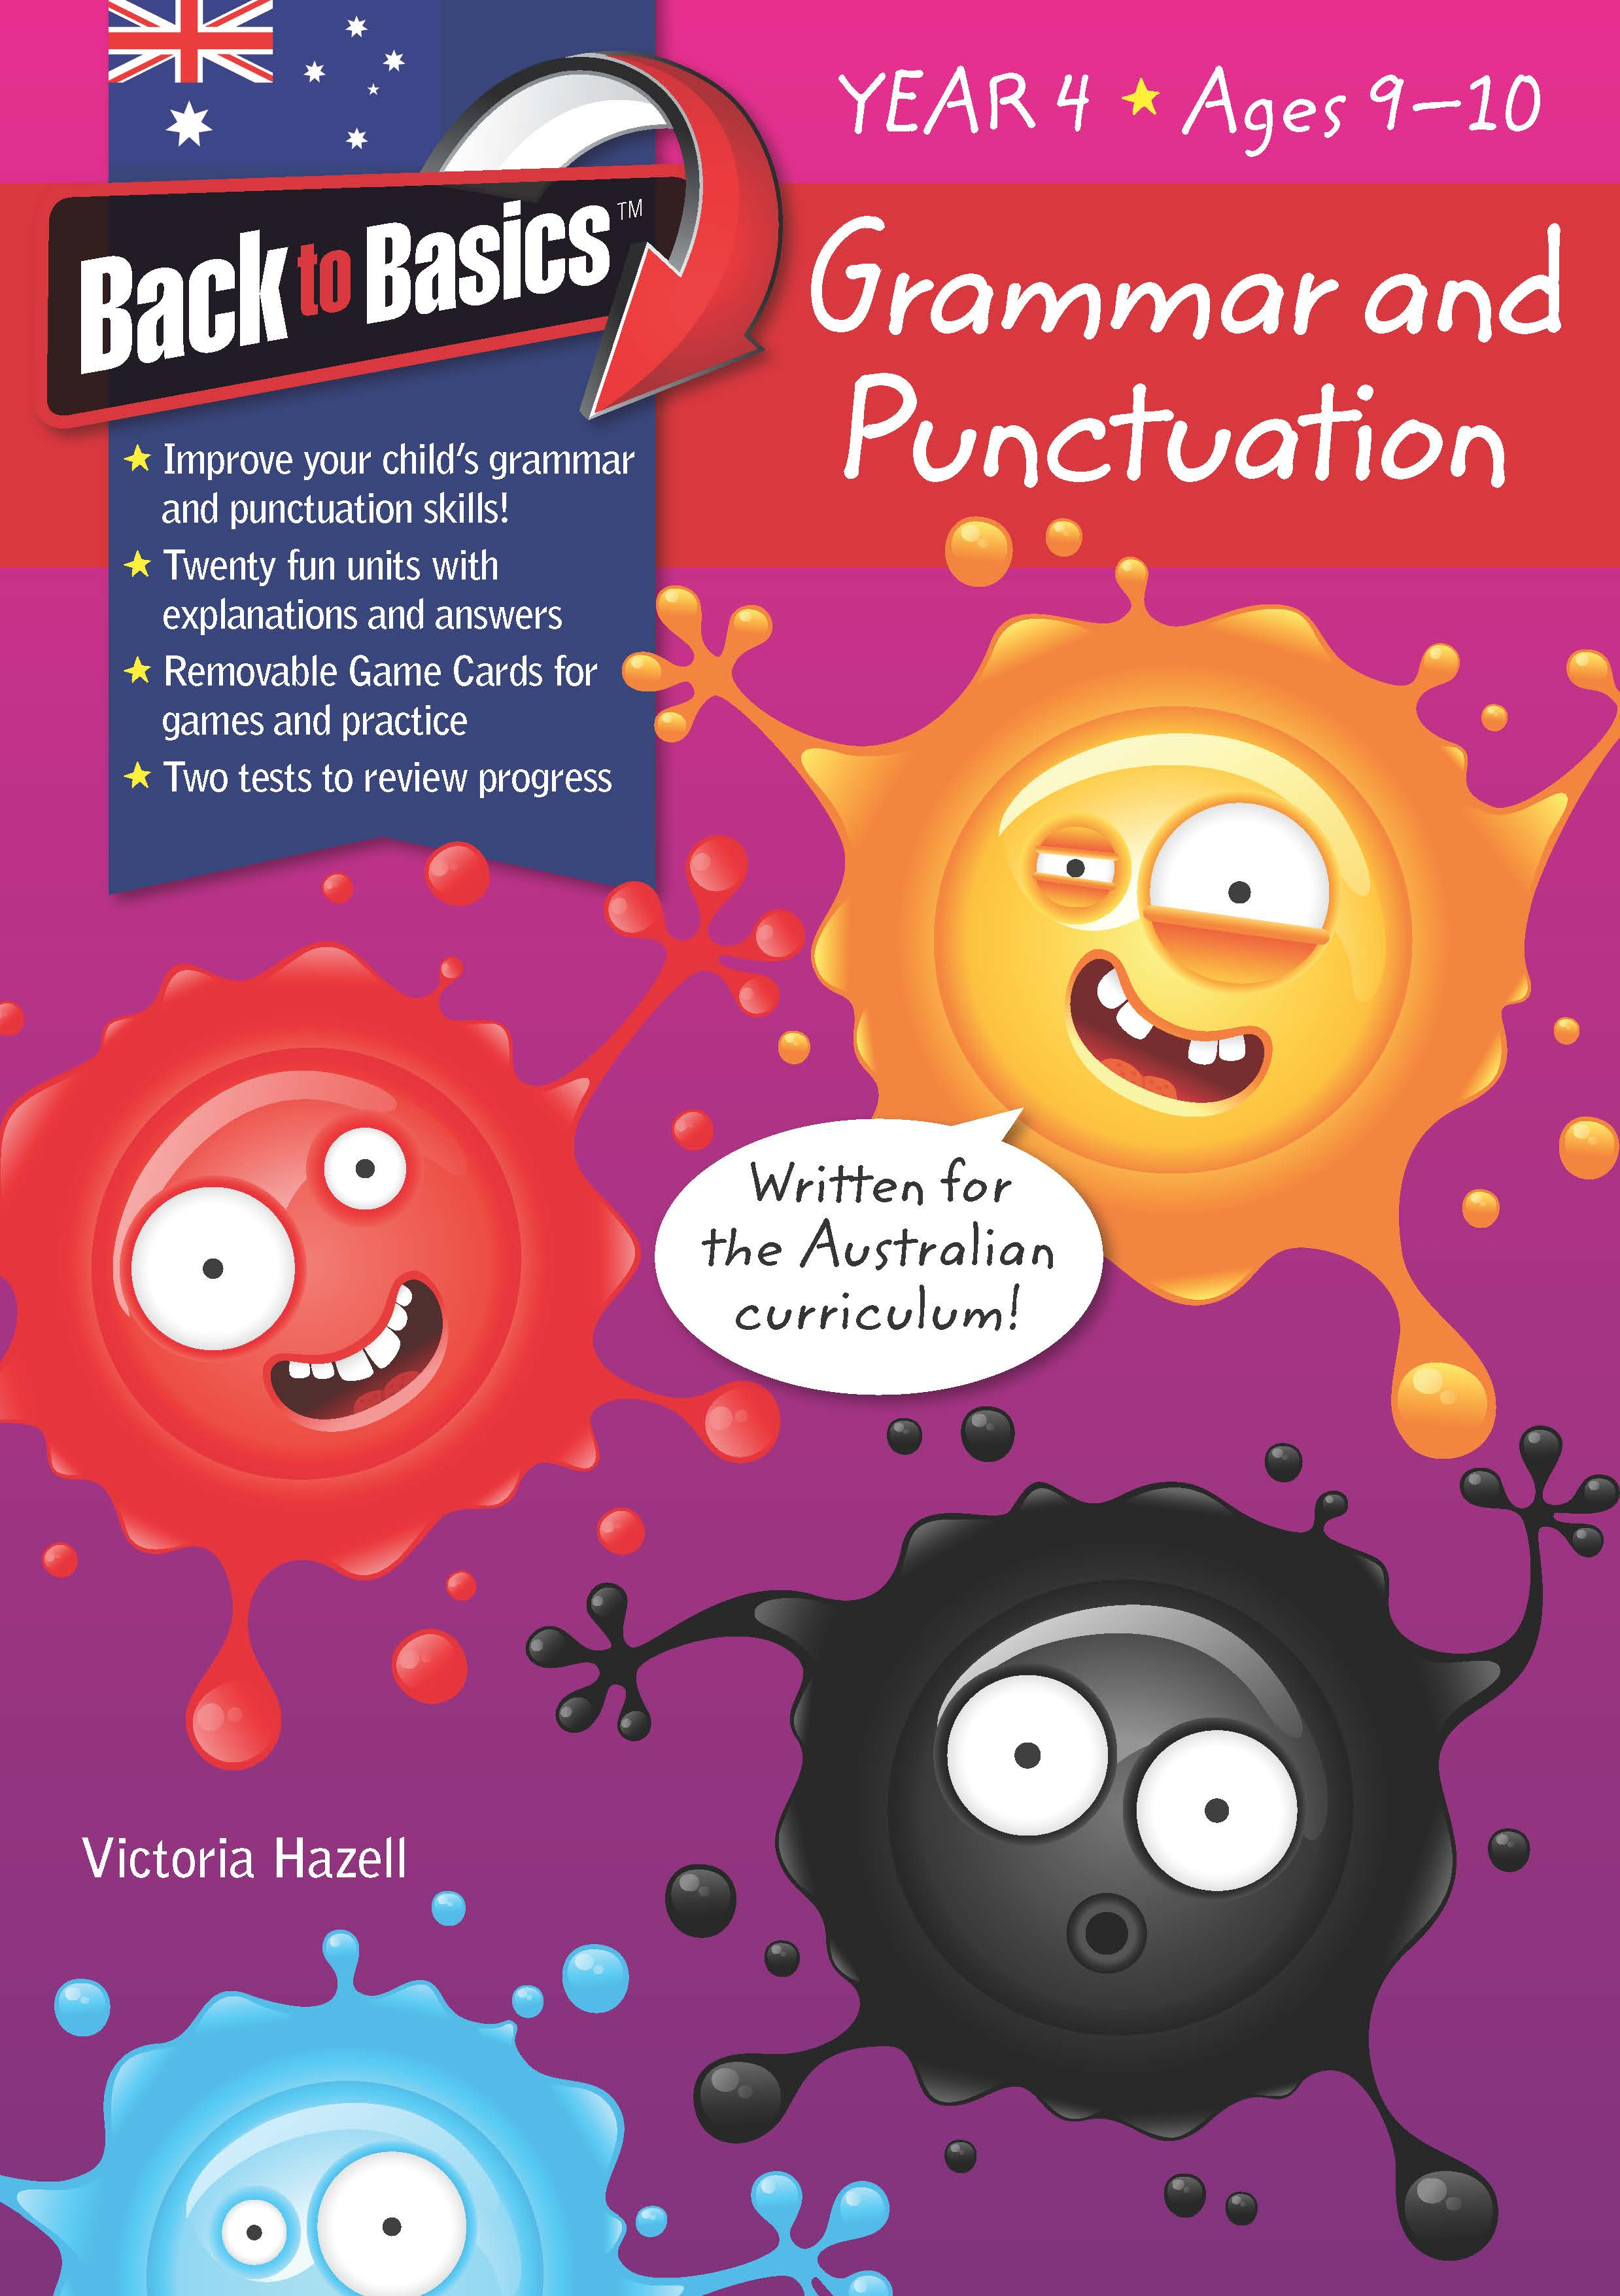 Back to Basics - Grammar & Punctuation Year 4